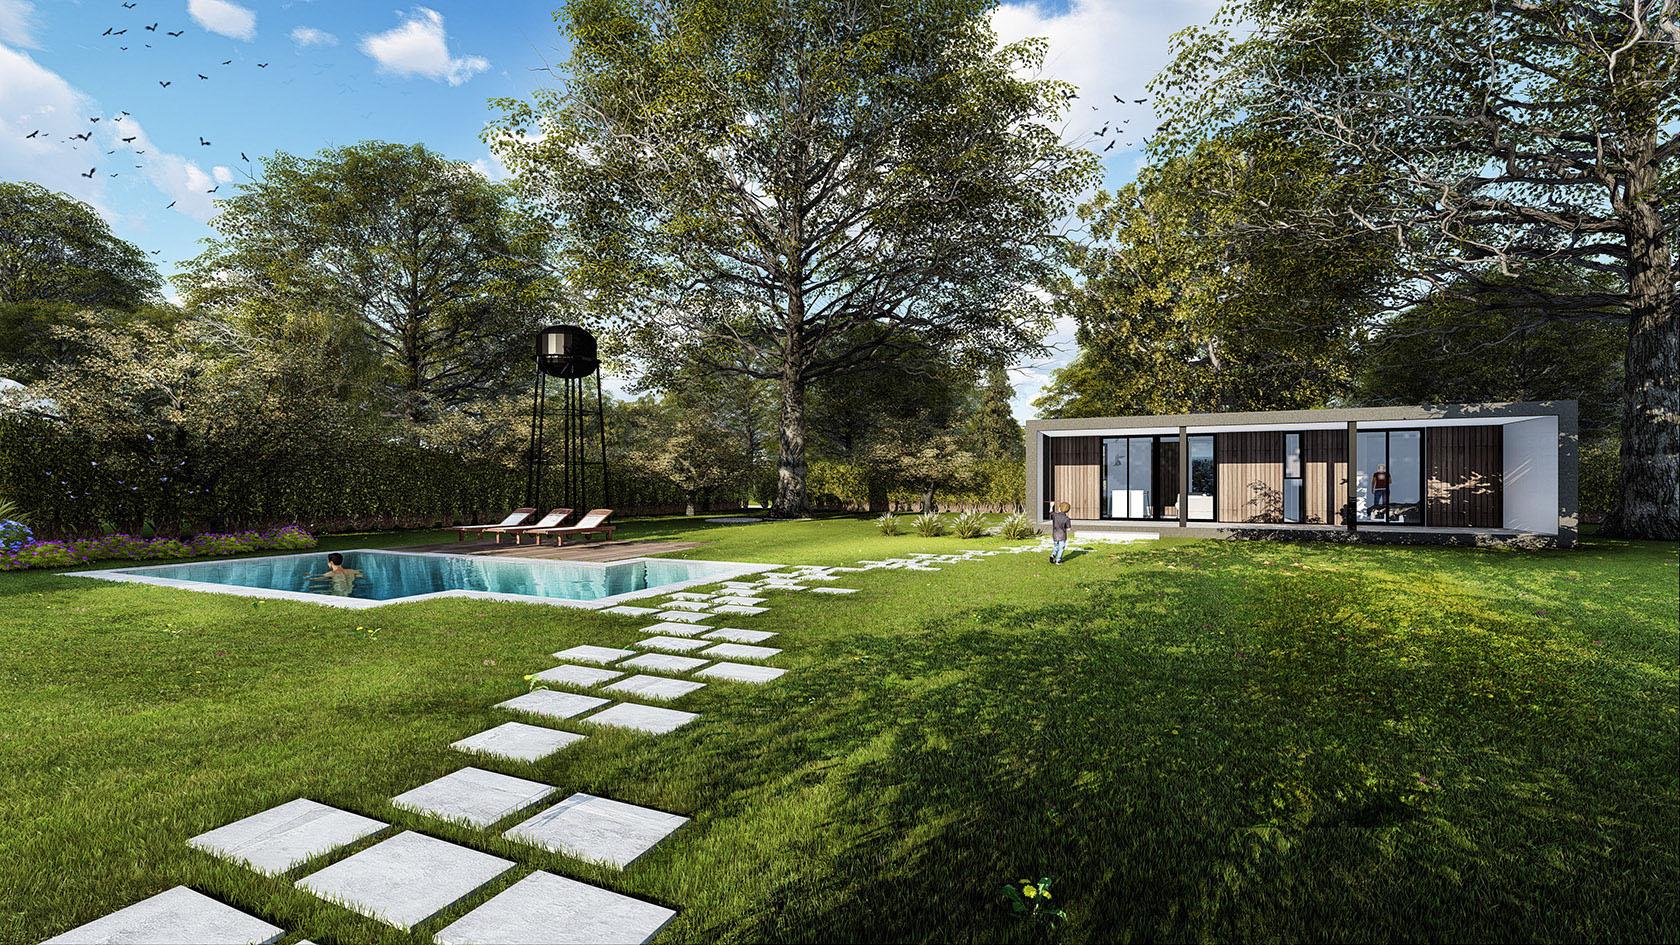 Diseño de caminos modernos, diseño de piletas modernas, diseño de casas en grandes terrenos